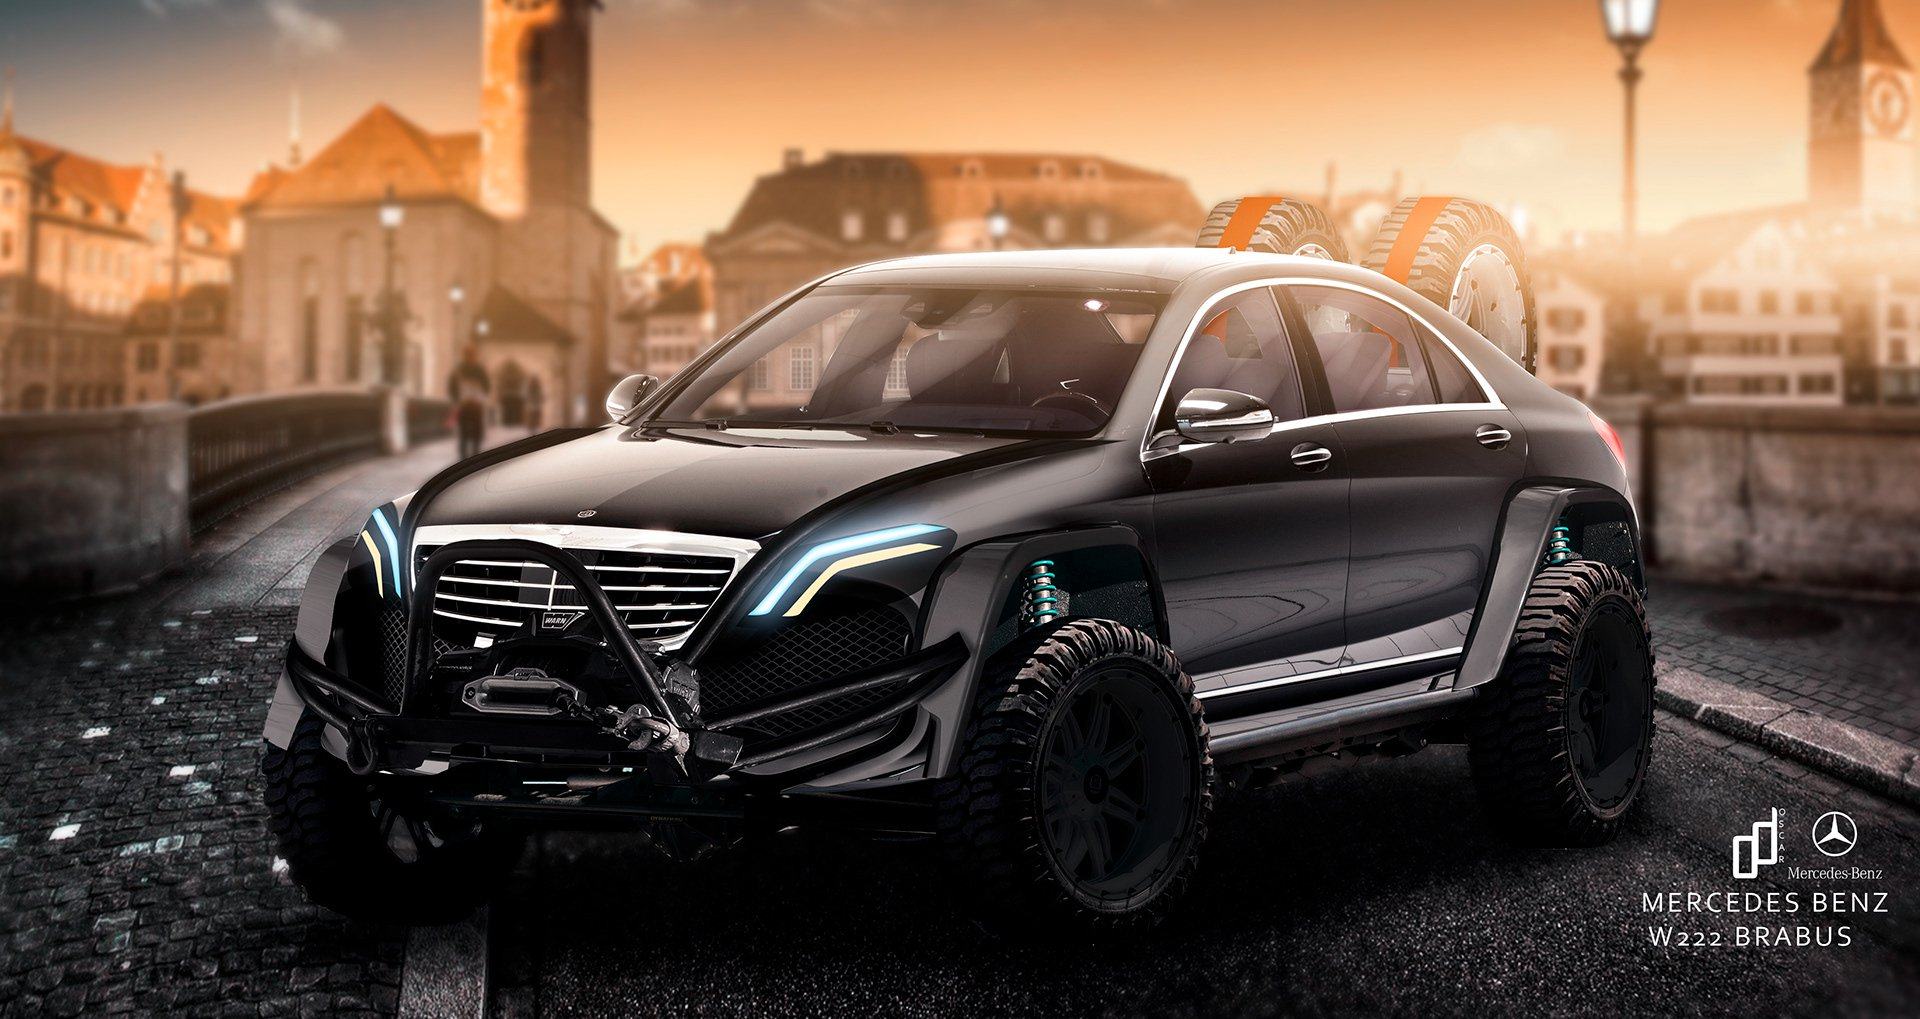 Mercedes S-Class Brabus превратили во внедорожник для ралли Дакар